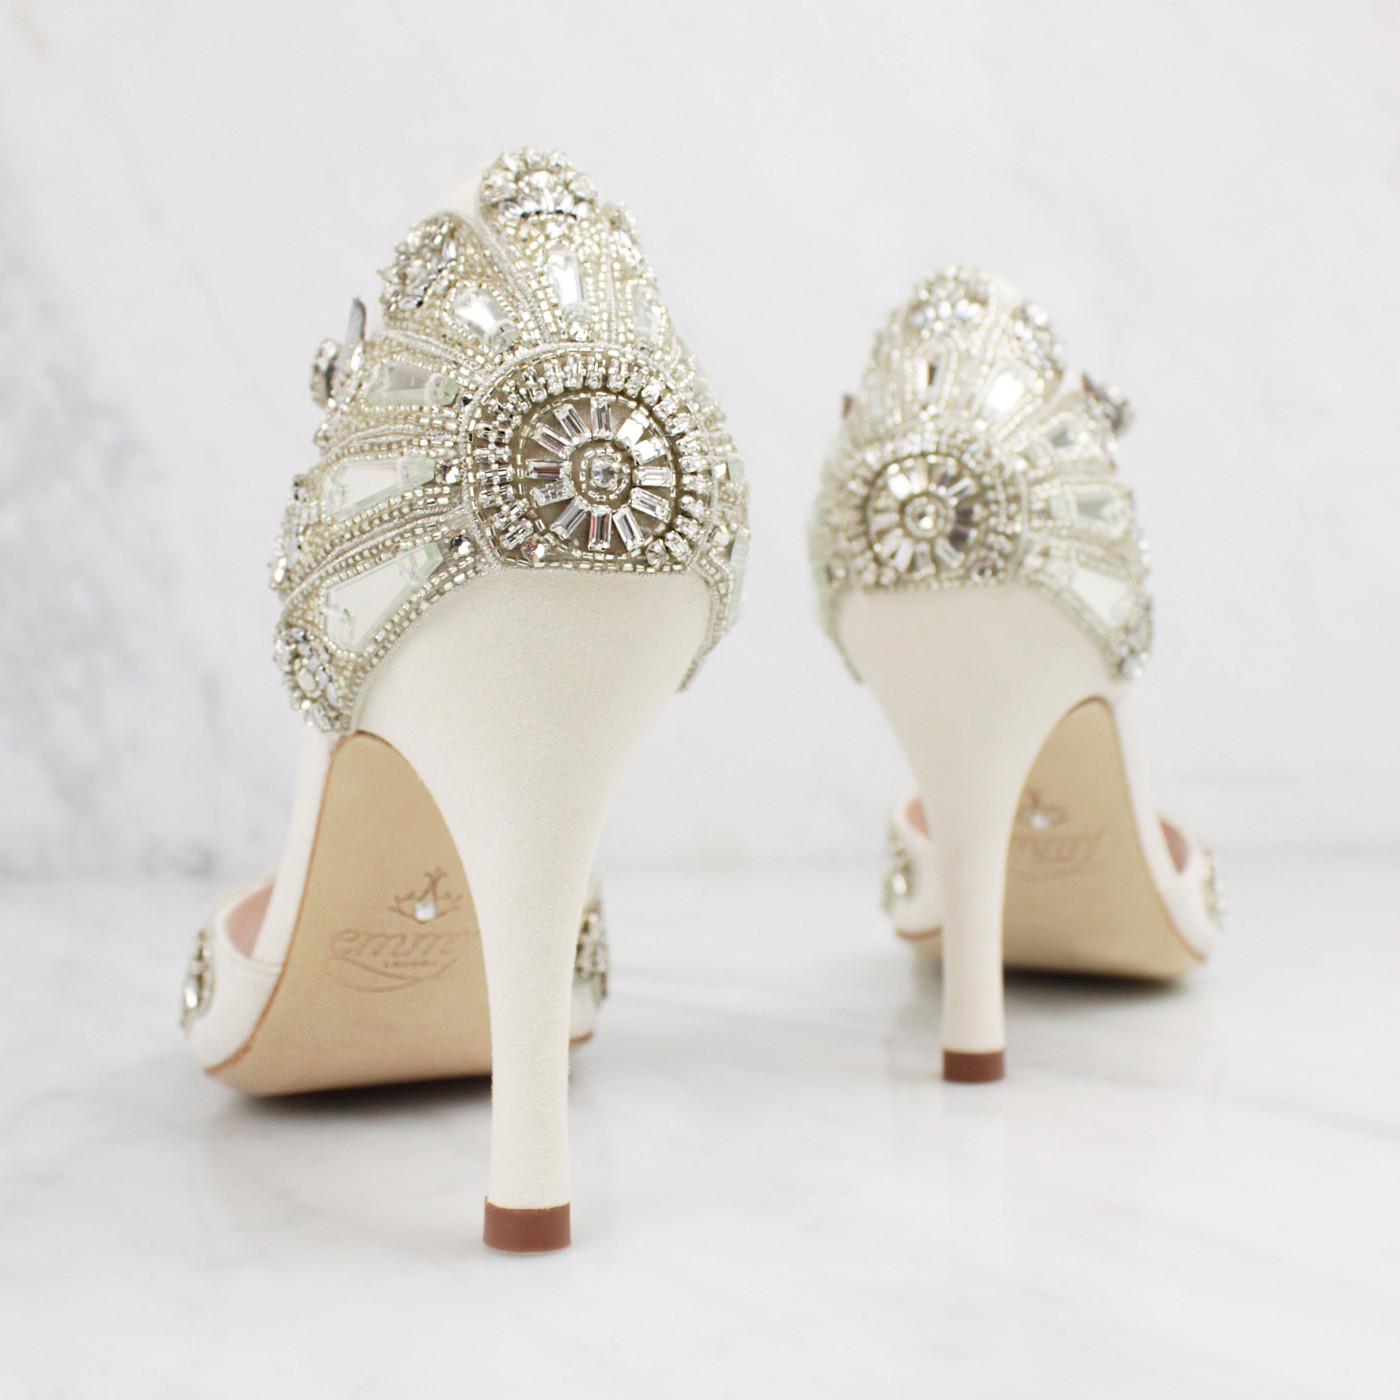 Glamorous Bridal Heels from Emmy London